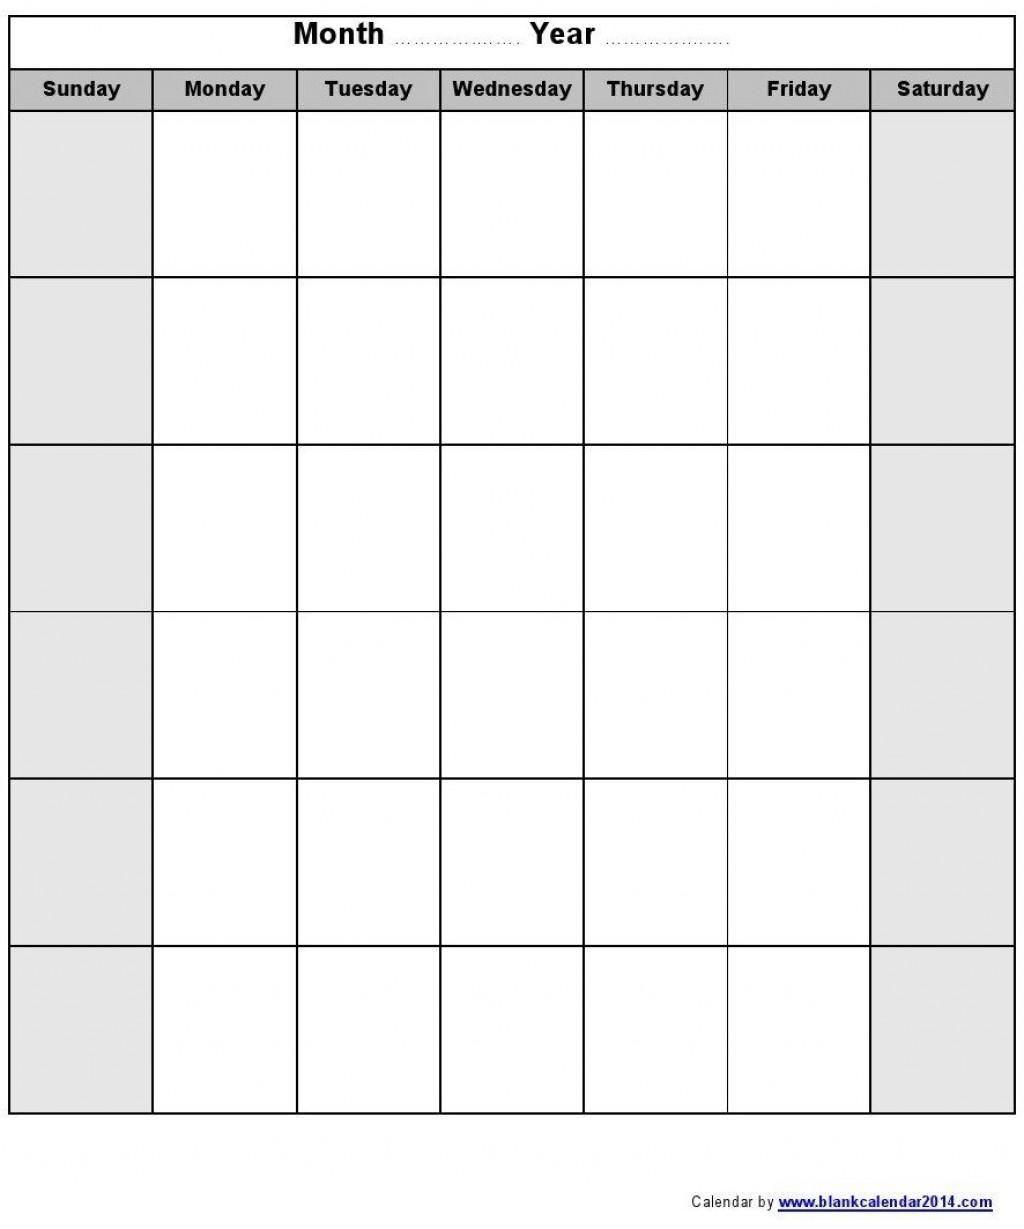 009 Impressive Printable Blank Monthly Calendar Template Image  PdfLarge